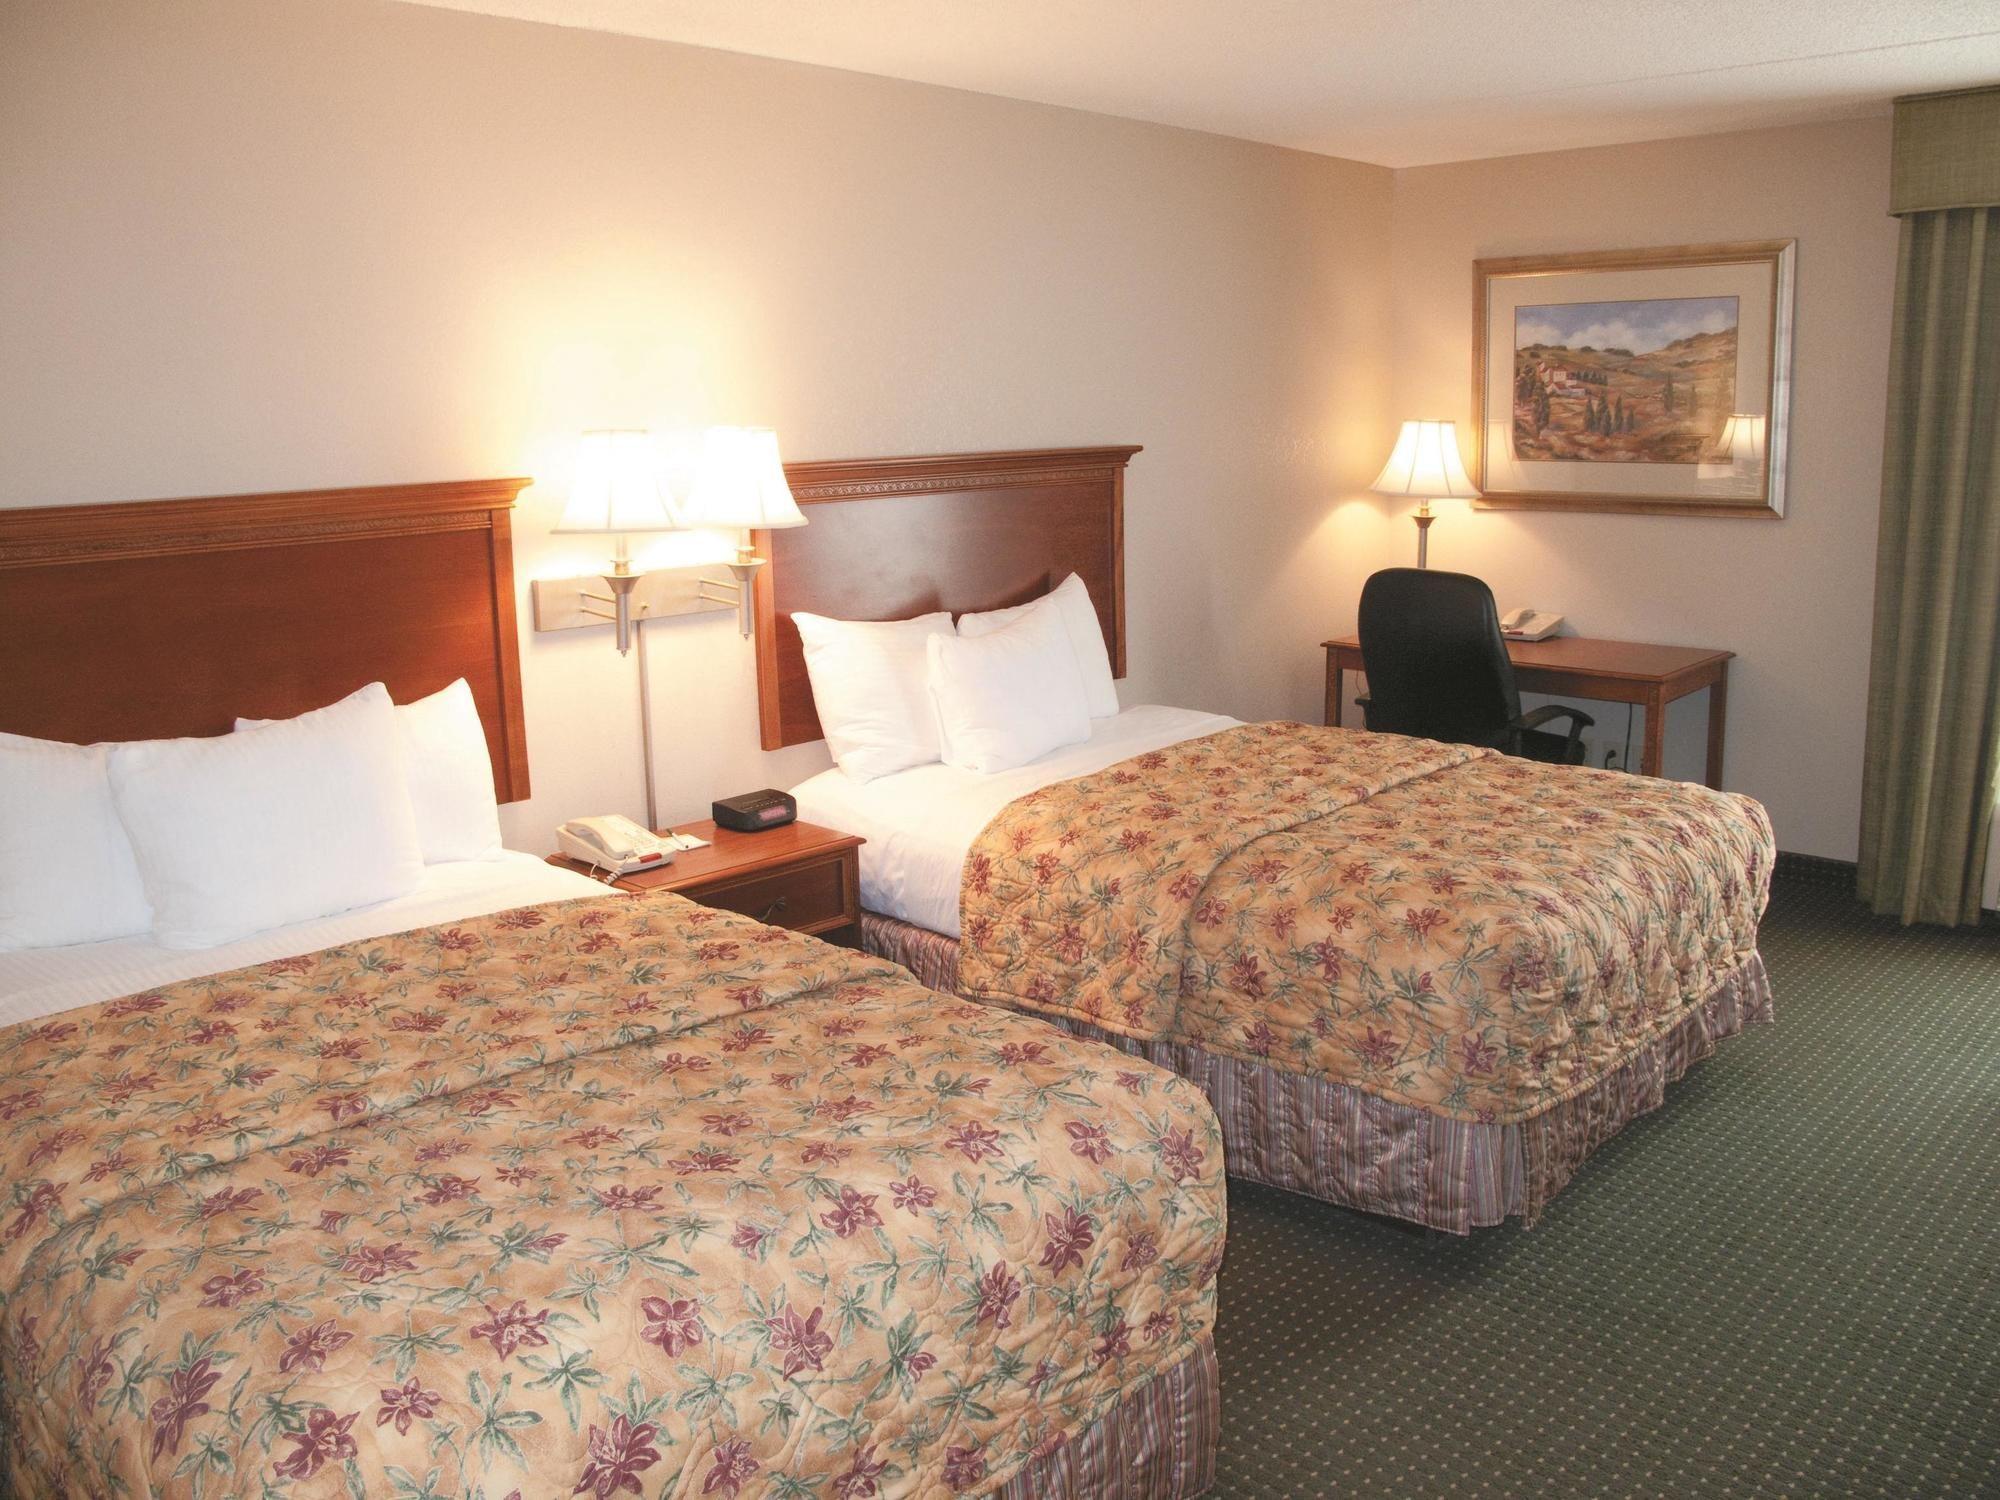 La Quinta Inn & Suites Atlanta-Douglasville in Douglasville, GA